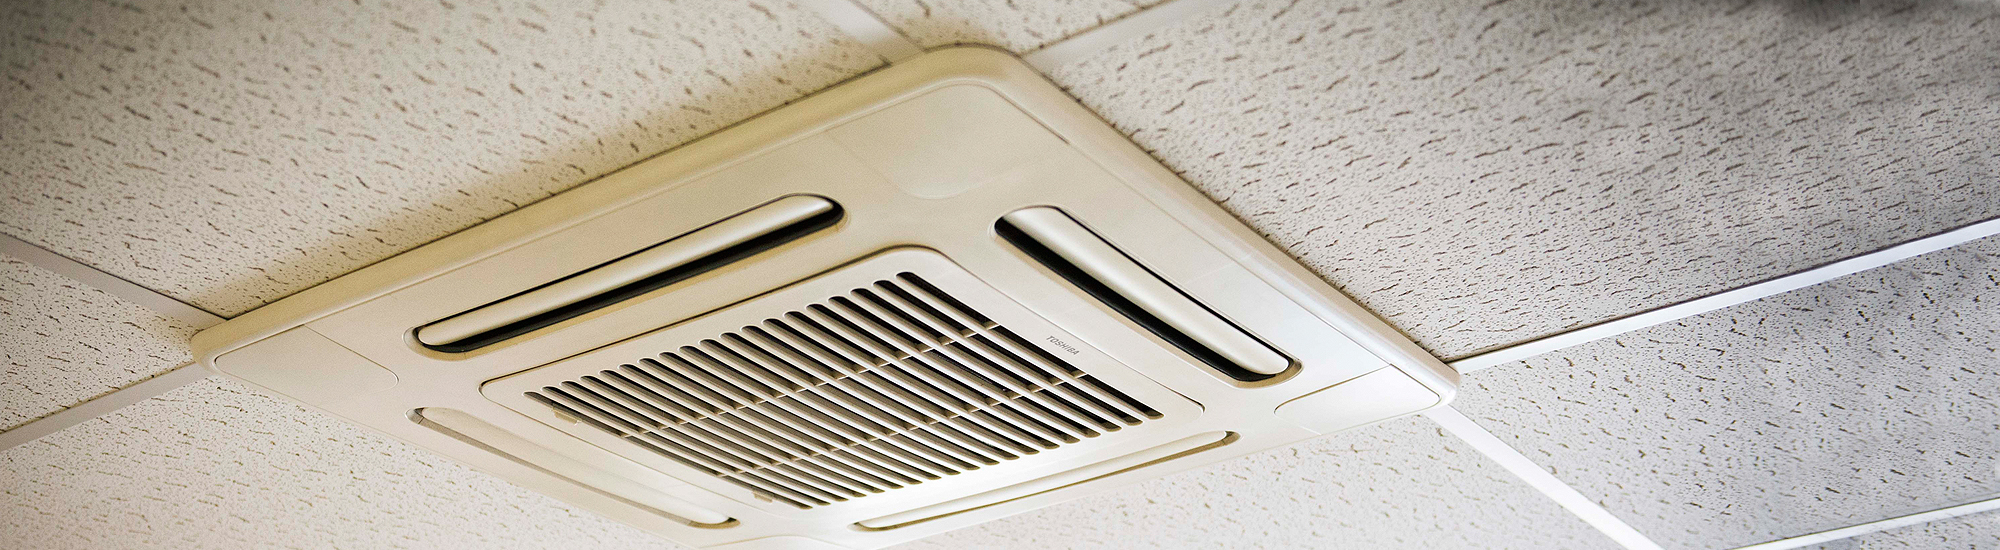 airconditioning1